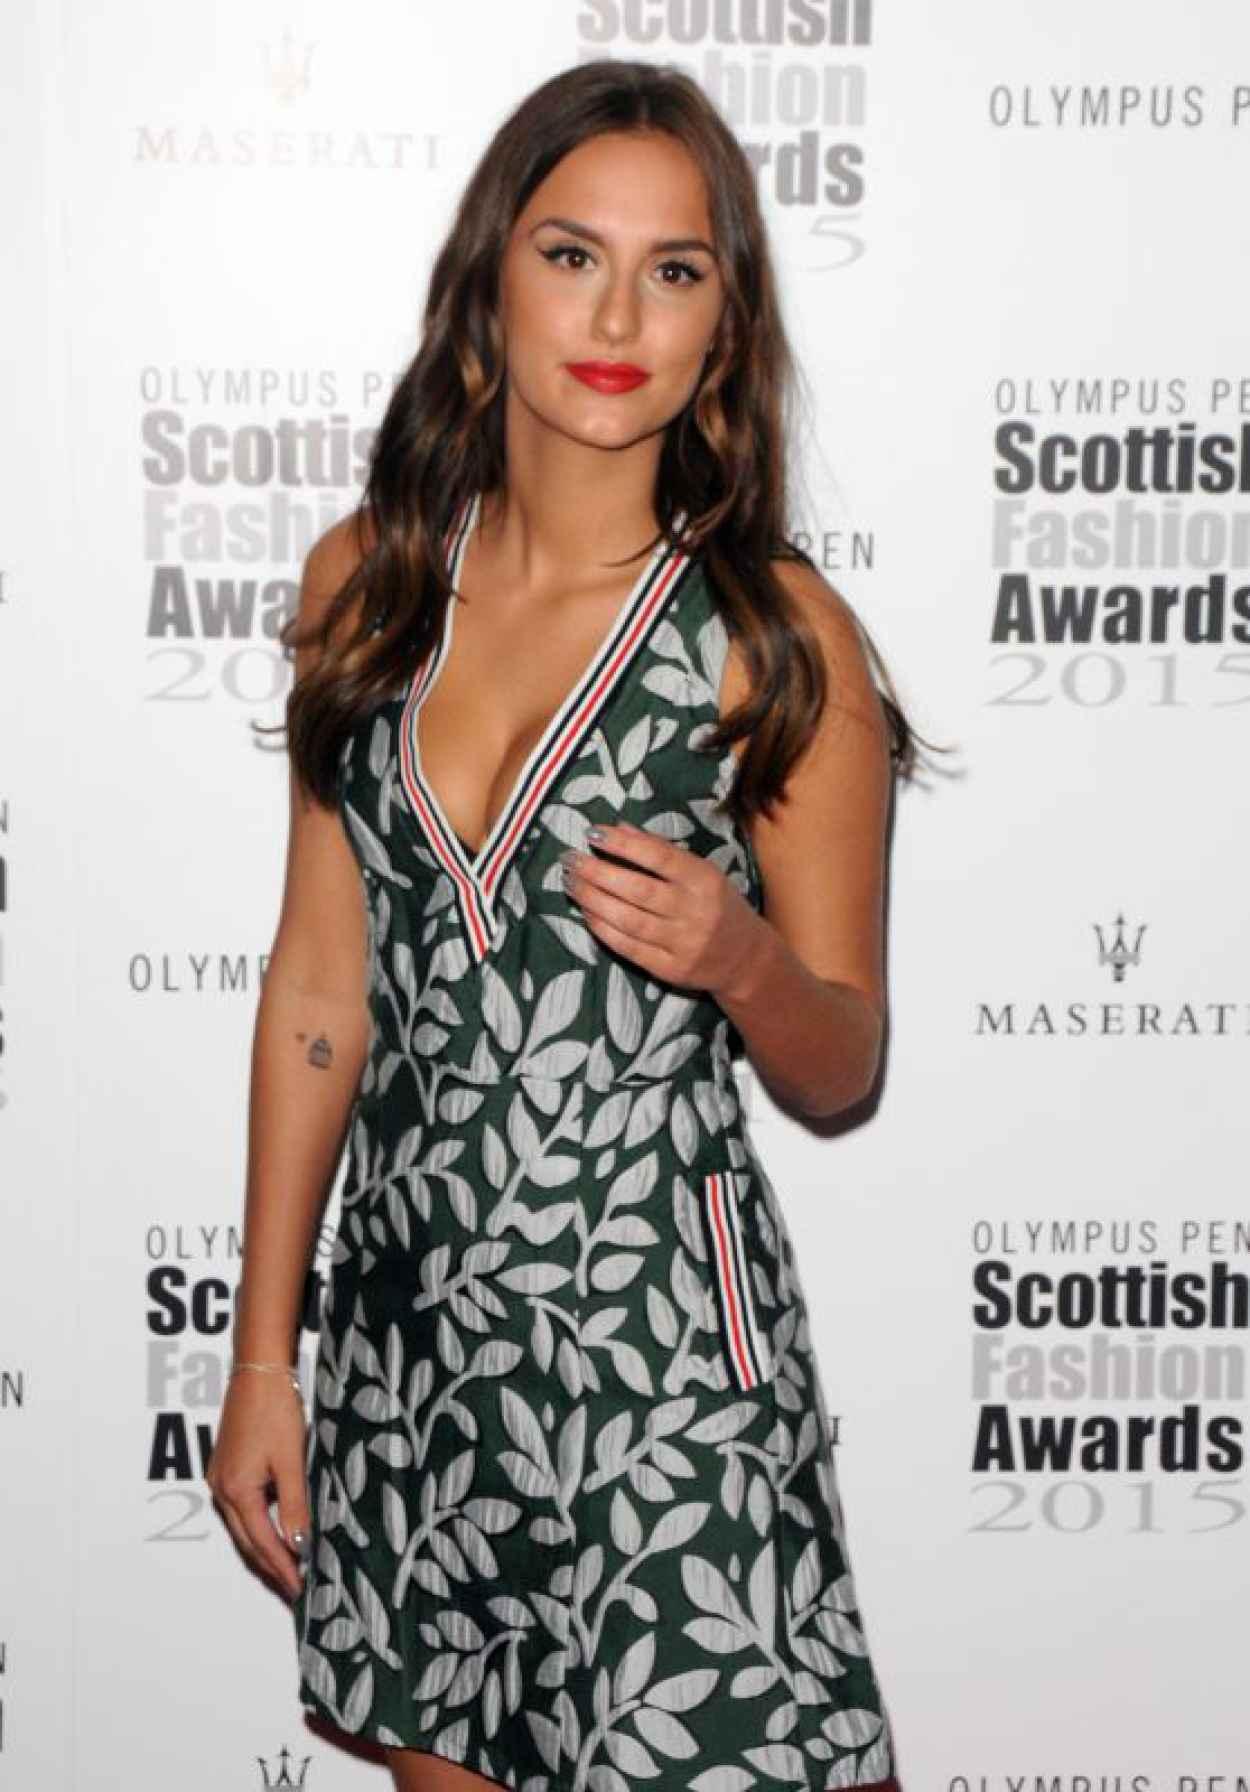 Lucy Watson - 2015 Scottish Fashion Awards in London-1